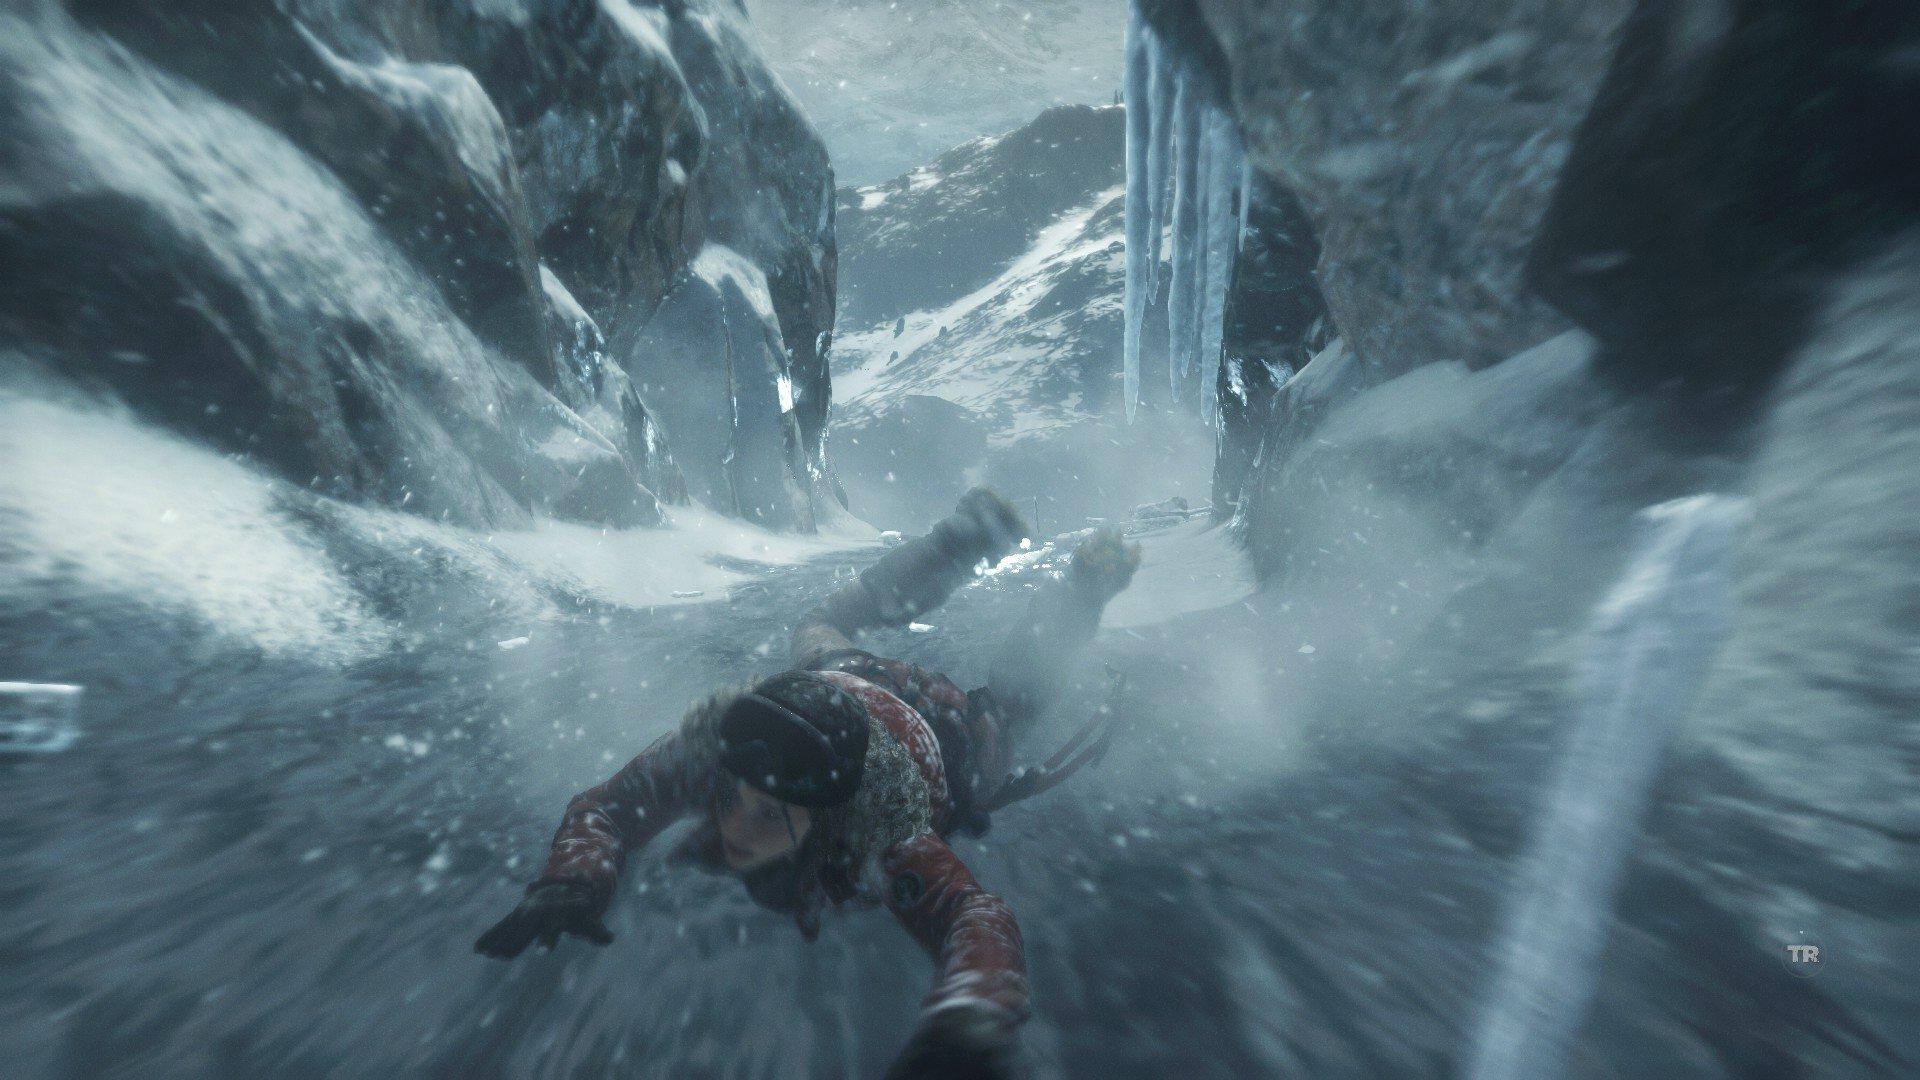 Rise of the Tomb Raider или да когда же этот медведь сдохнет?. - Изображение 27